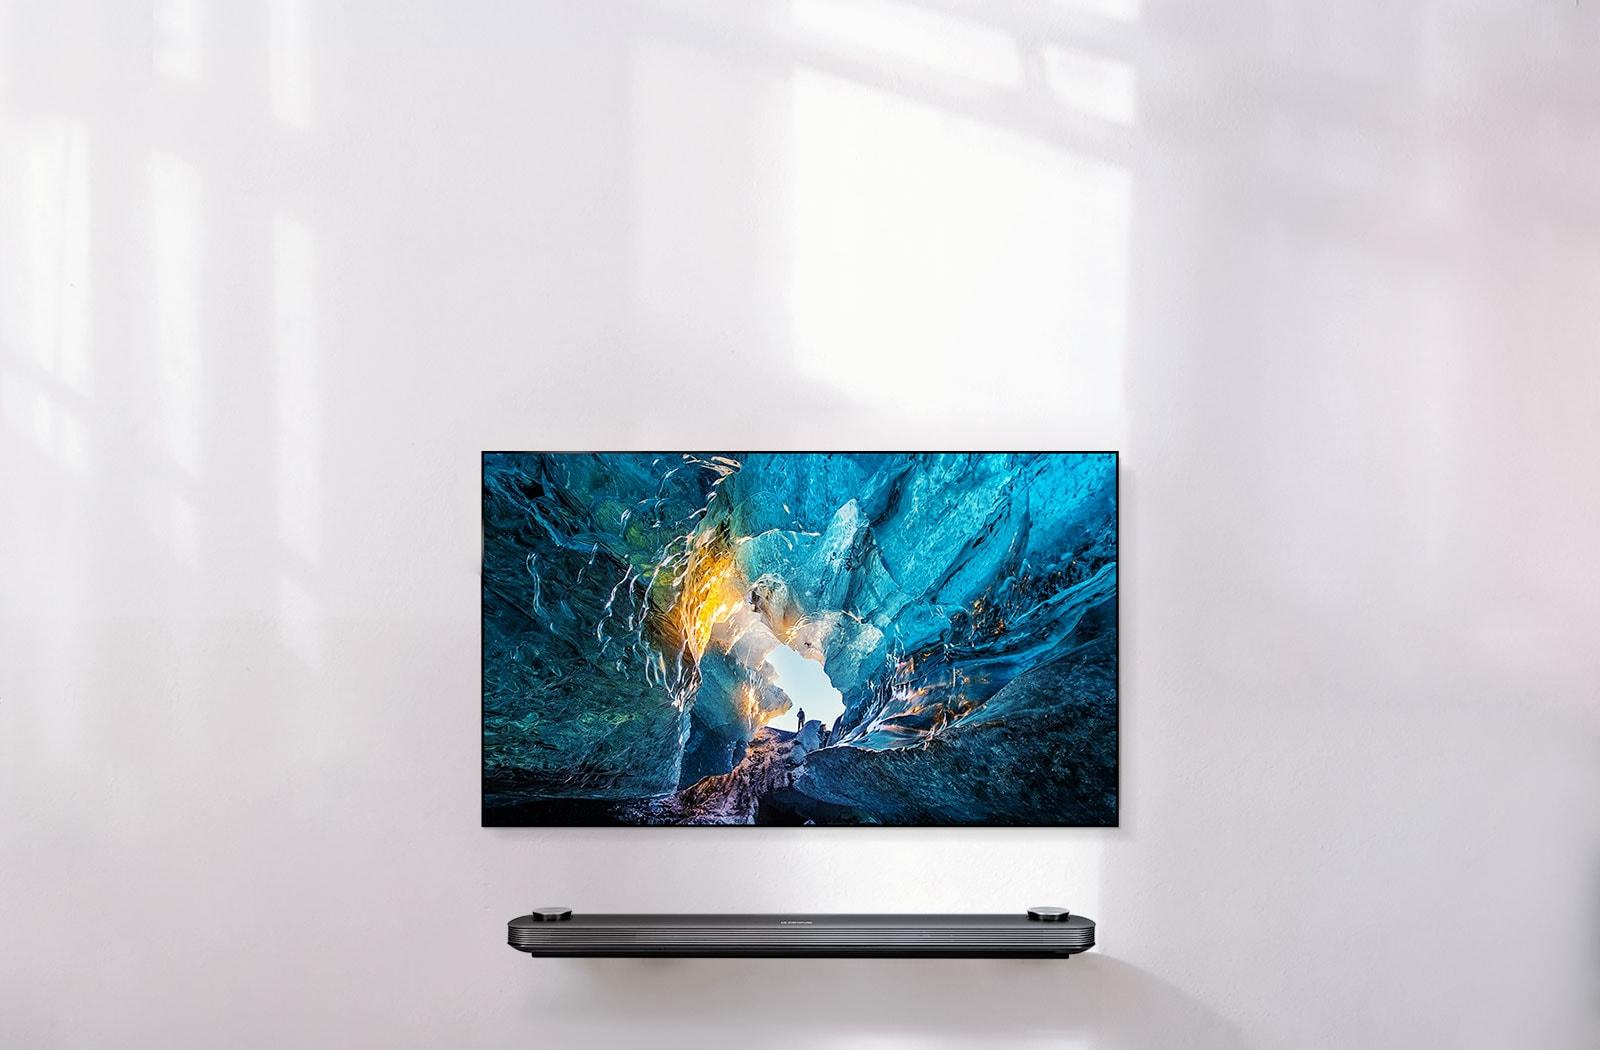 Lg Signature Oled Tv W 4k Hdr Smart Tv 65 Class 645 Diag